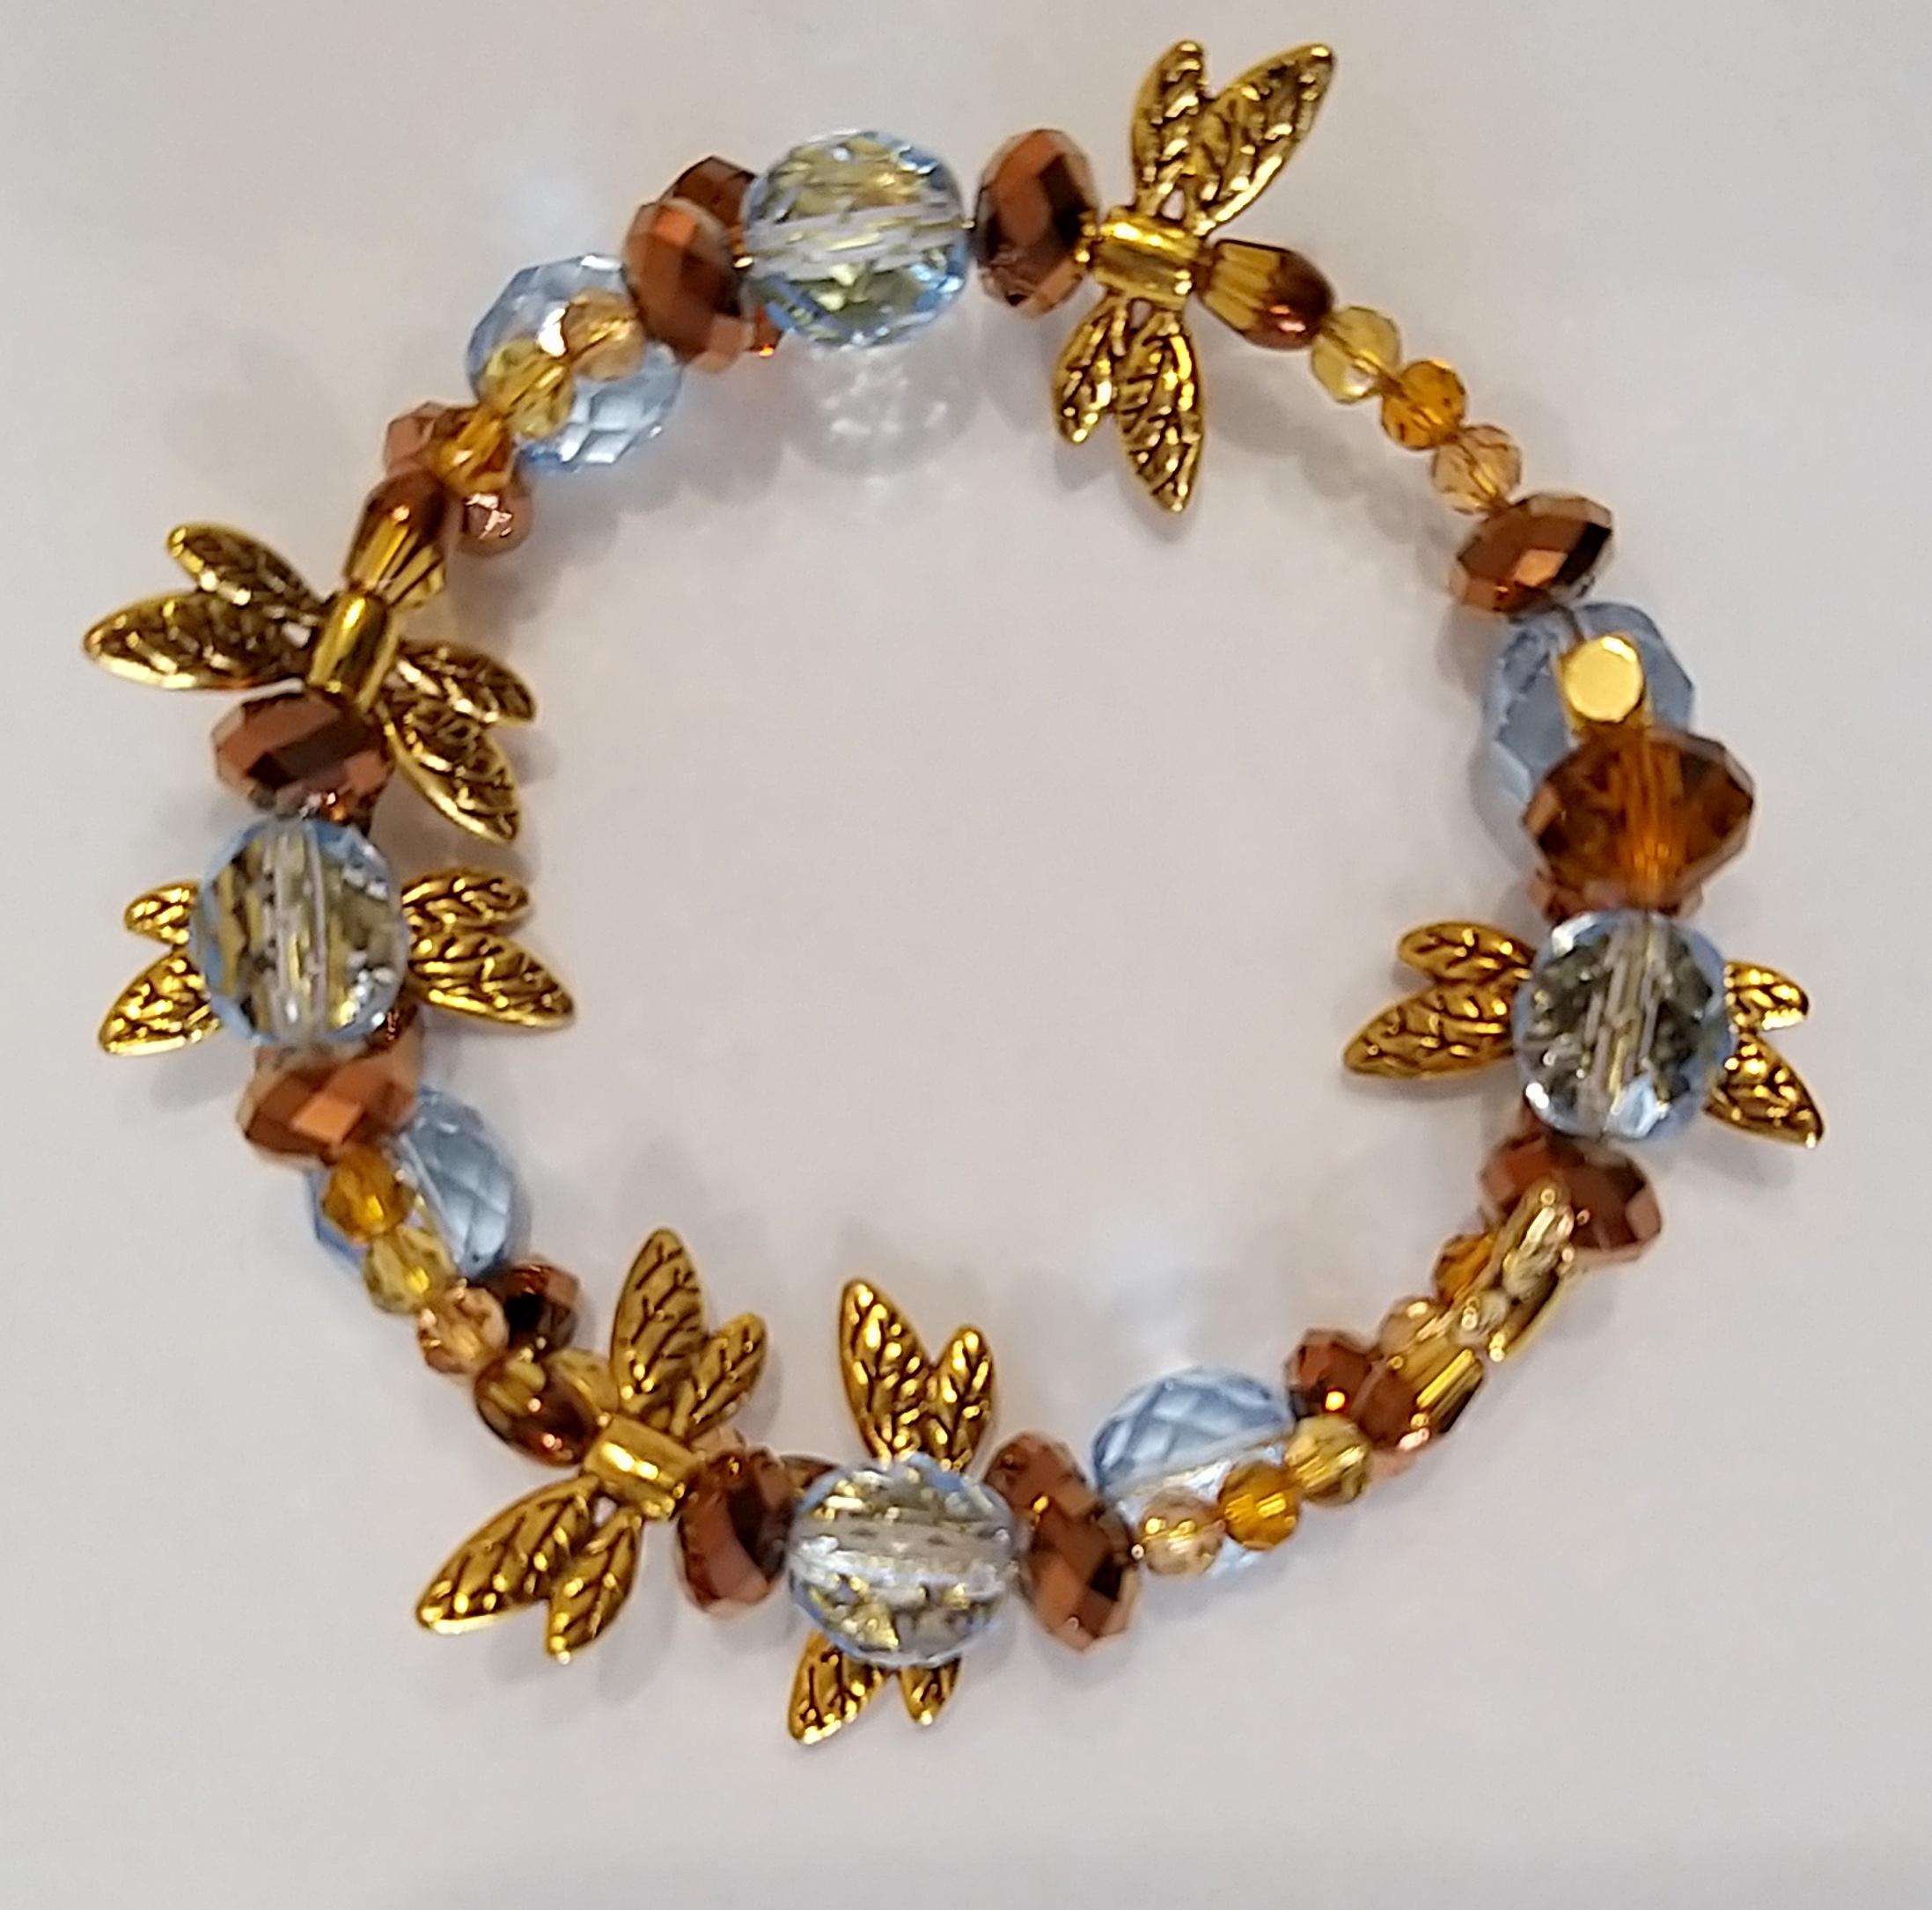 #FP-B 190810 Bracelet  Suggested $25 USD